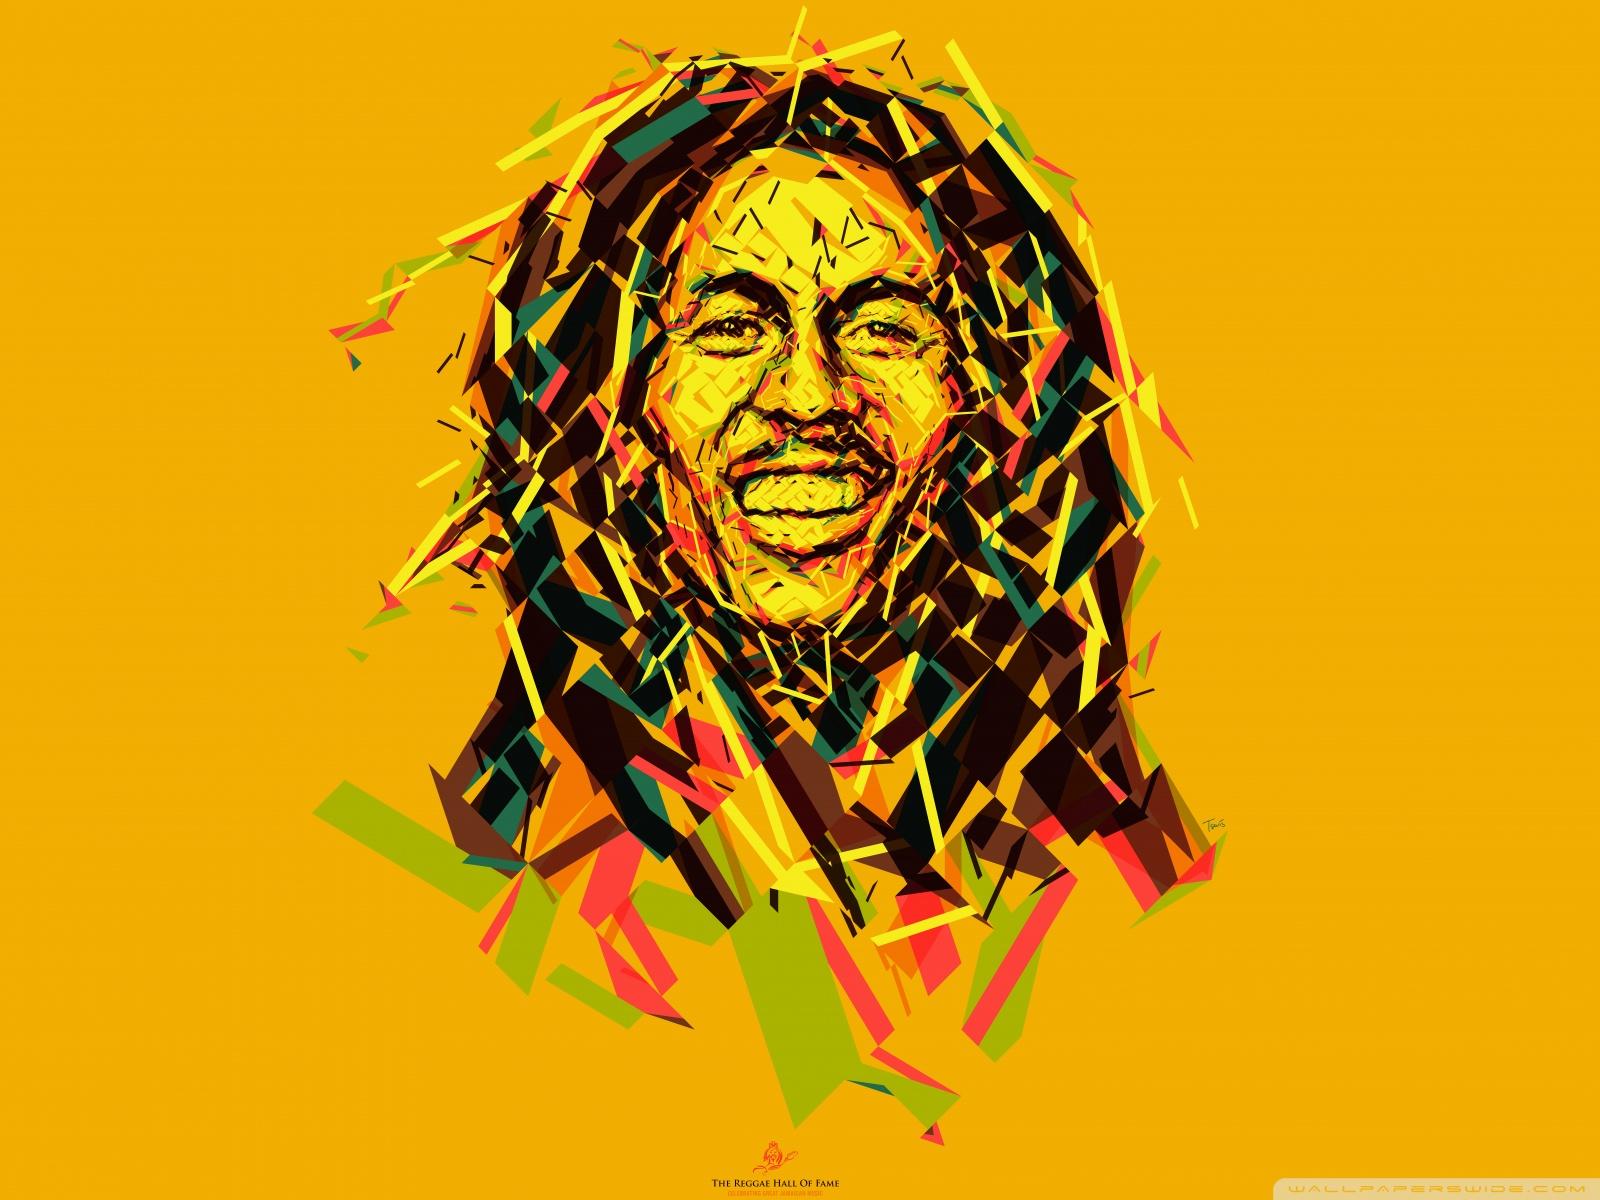 Free Bob Marley - Wake up and Live phone wallpaper by shrimpypippi